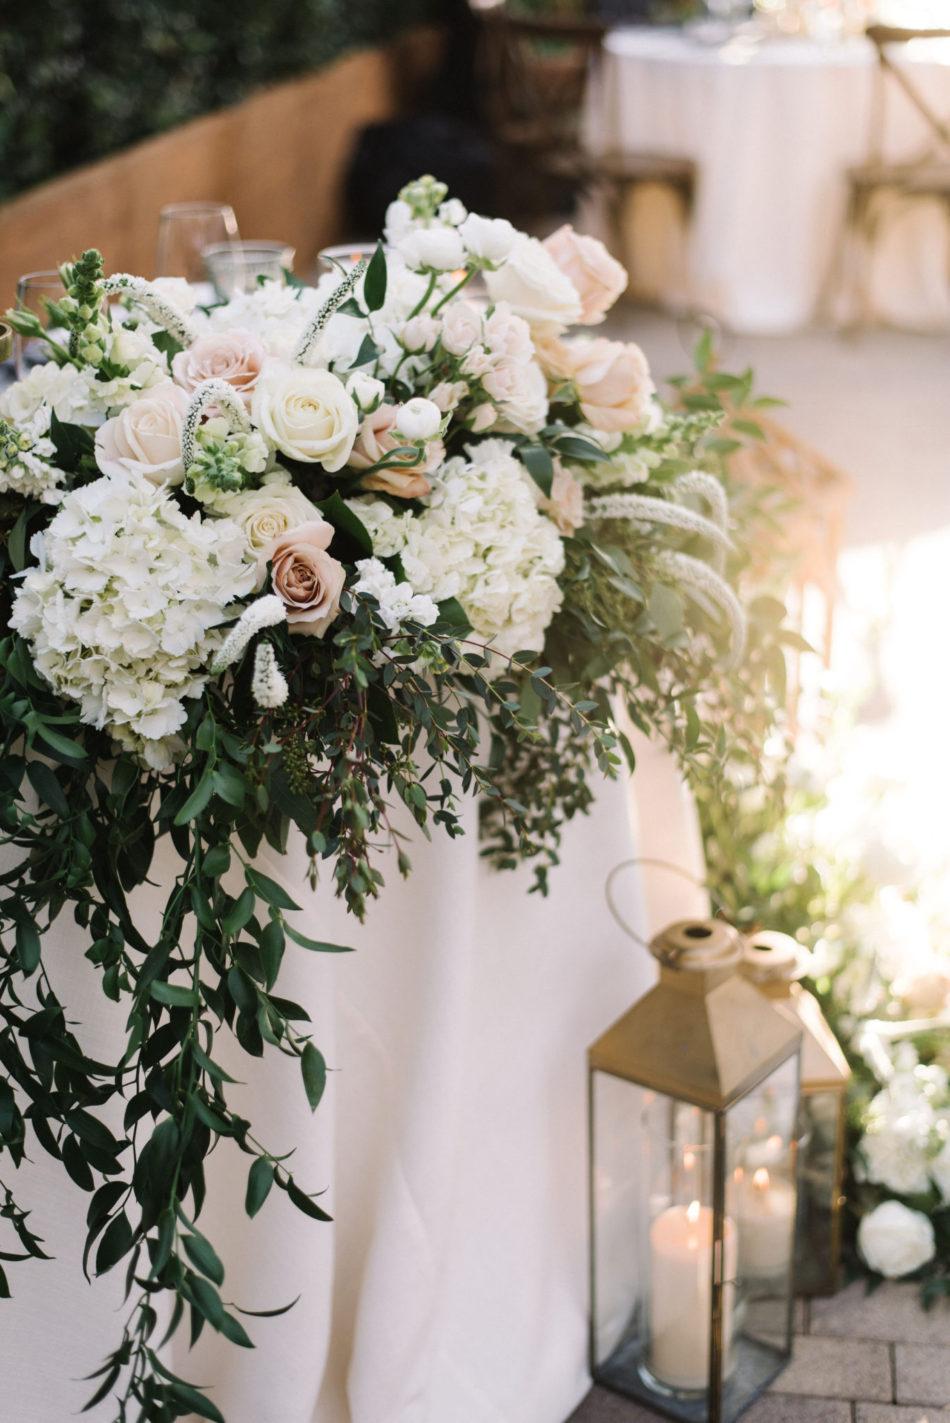 floral design, florist, wedding florist, wedding flowers, orange county weddings, orange county wedding florist, orange county florist, orange county floral design, flowers by cina, white florals, blush florals, white blooms